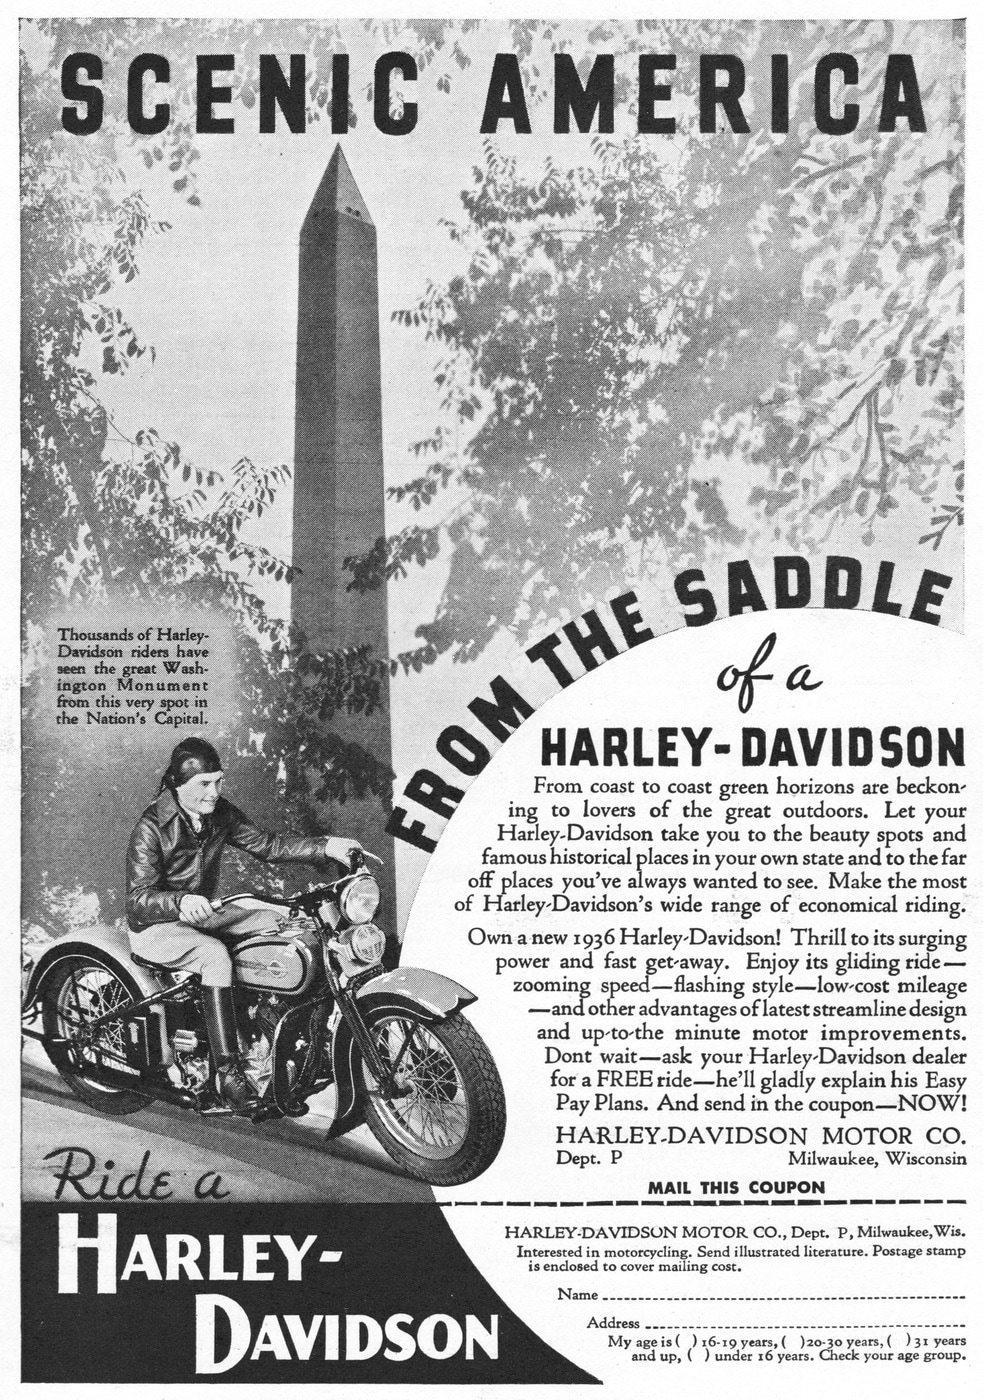 Harley-Davidson at Washington Monument